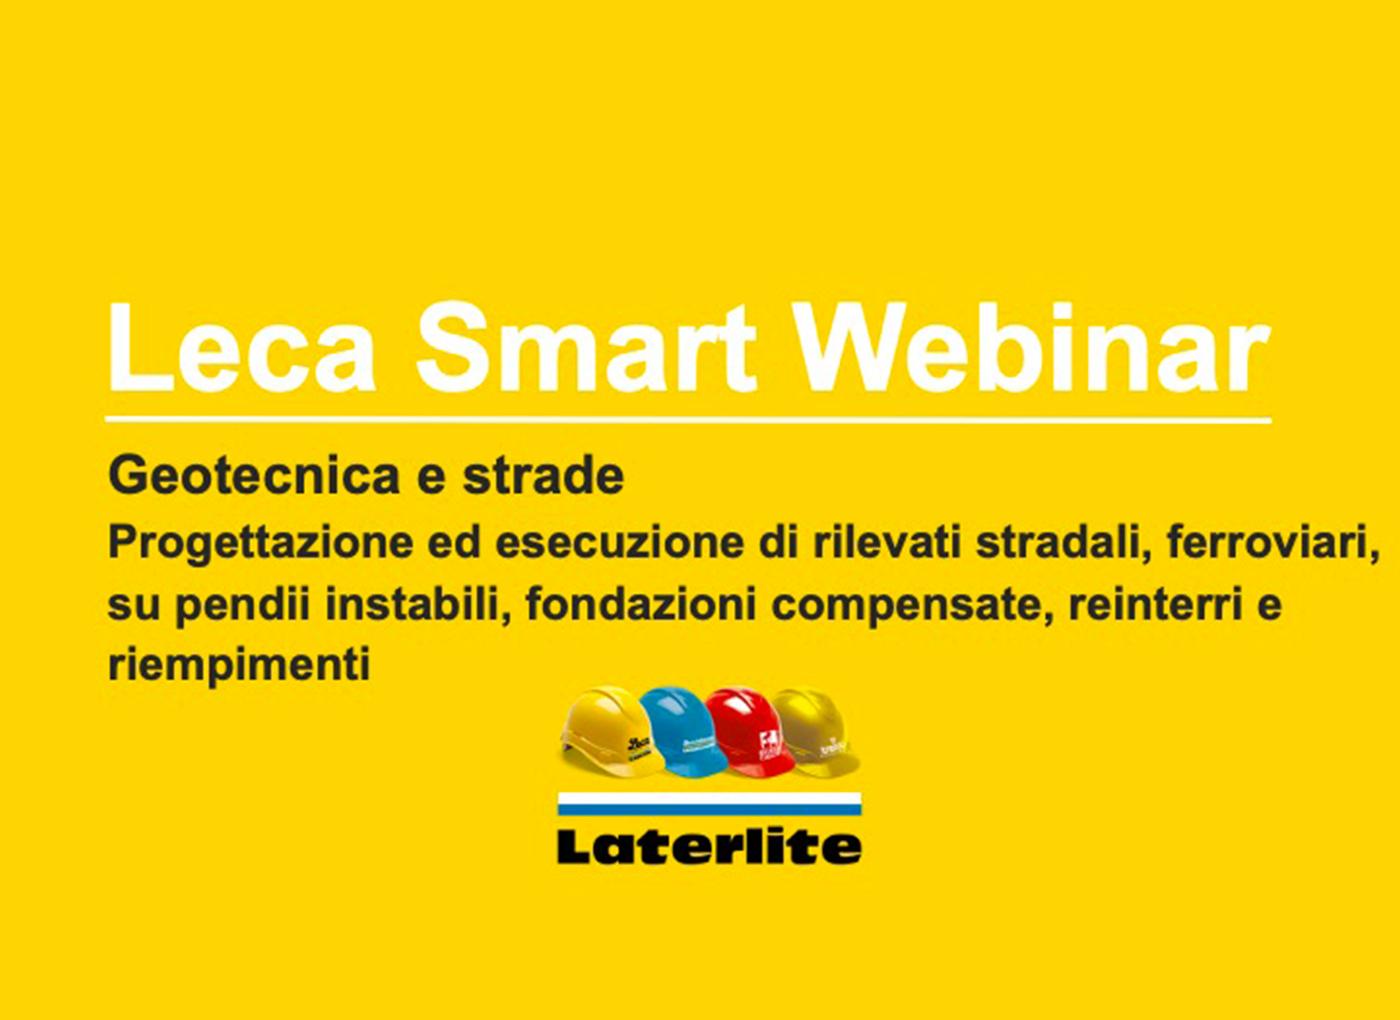 video-leca-smart-webinar-geotecnica-strade